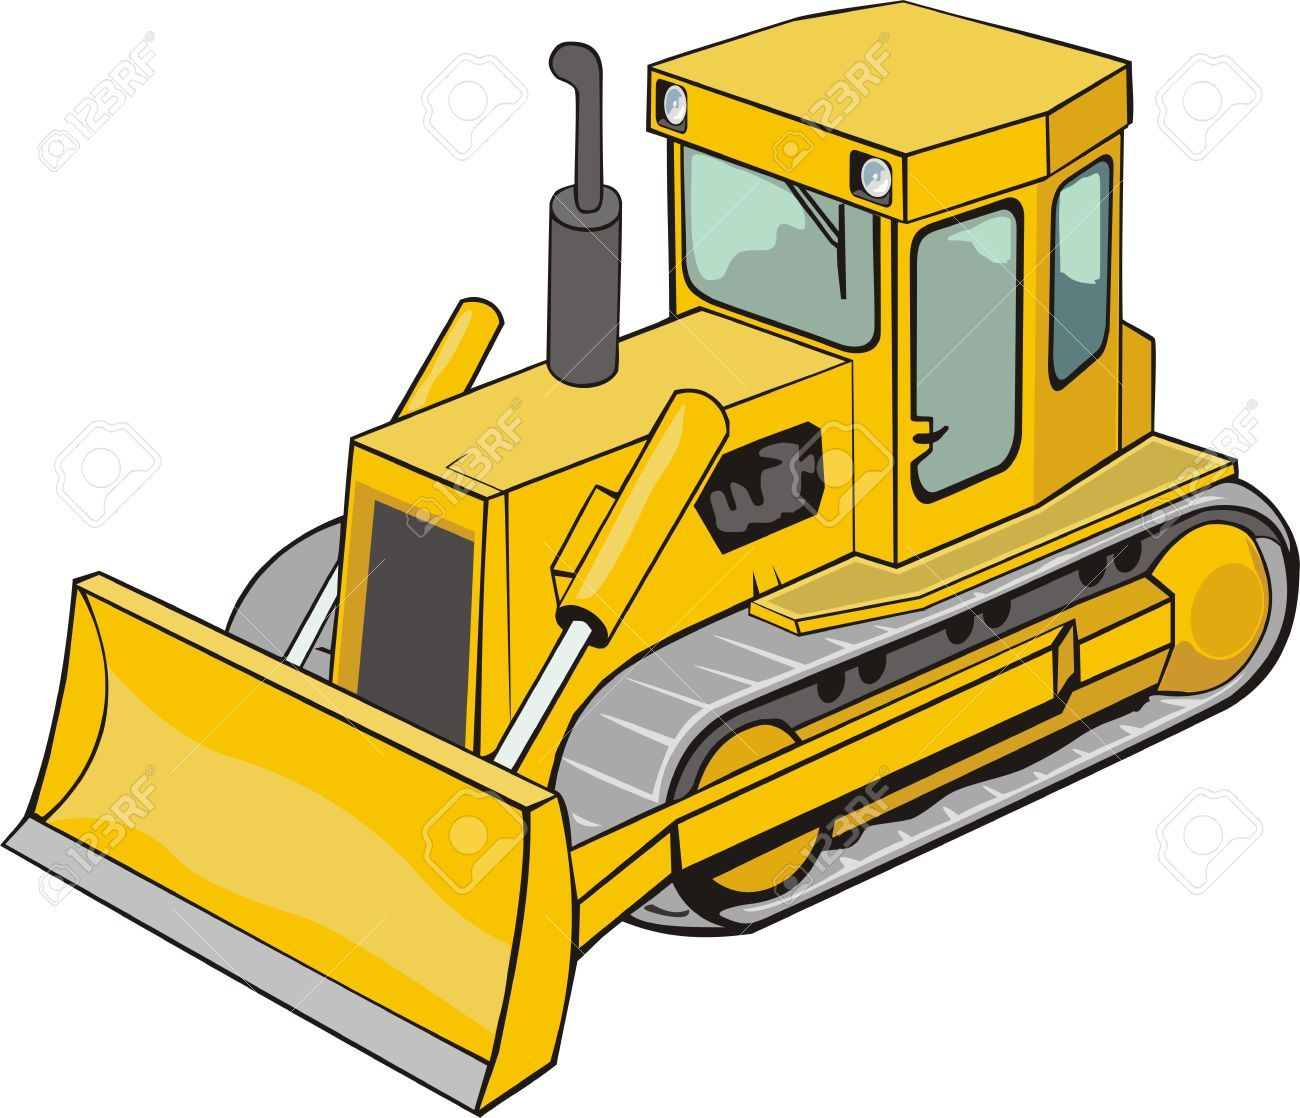 png transparent Stock anderson turns caterpillar. Bulldozer clipart vector.